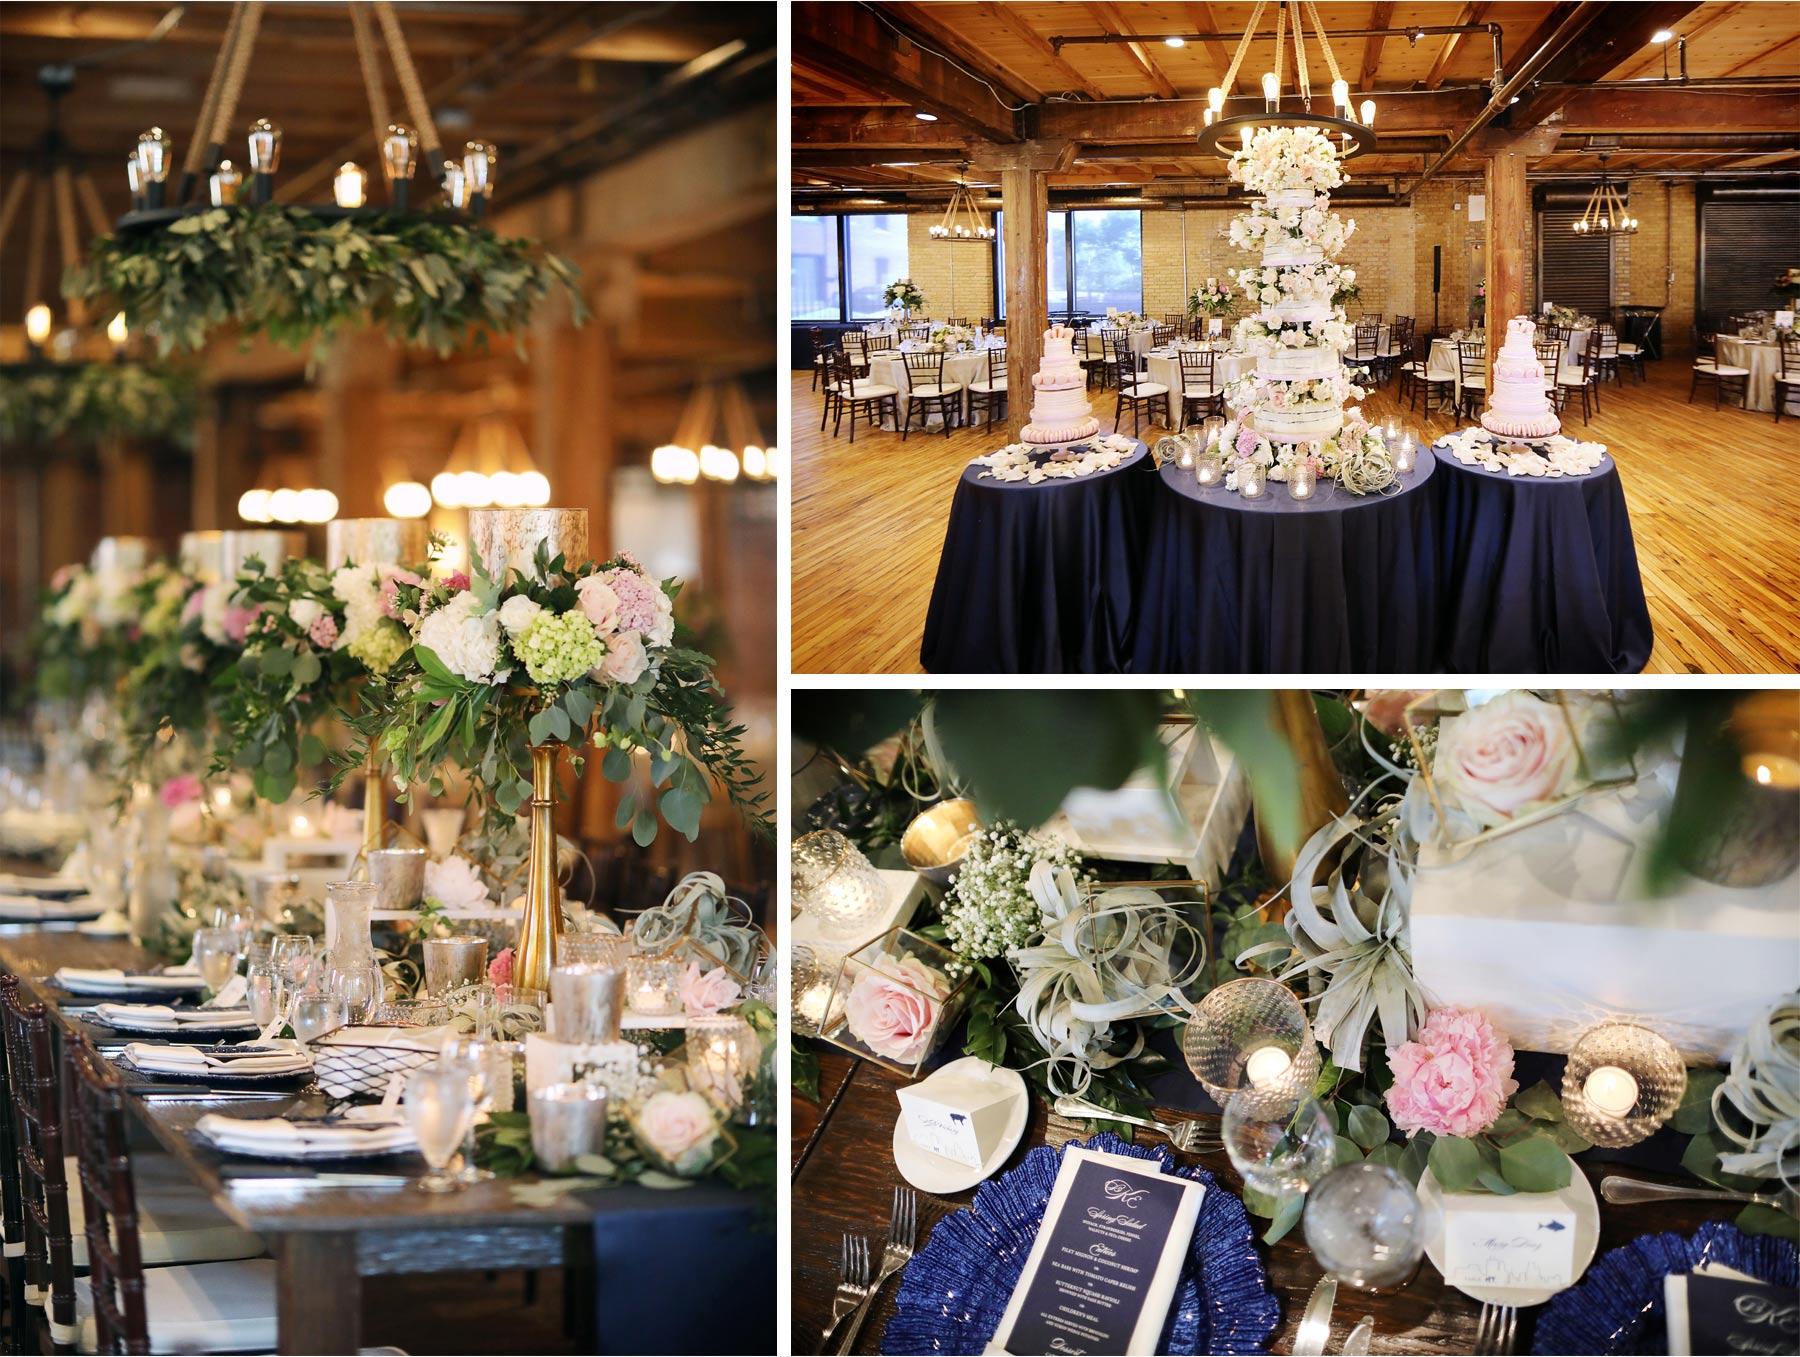 19-Minneapolis-Minnesota-Wedding-Photography-by-Vick-Photography-The-View-Minneapolis-Event-Center-Reception-Decor-Brigid-and-Ernie.jpg